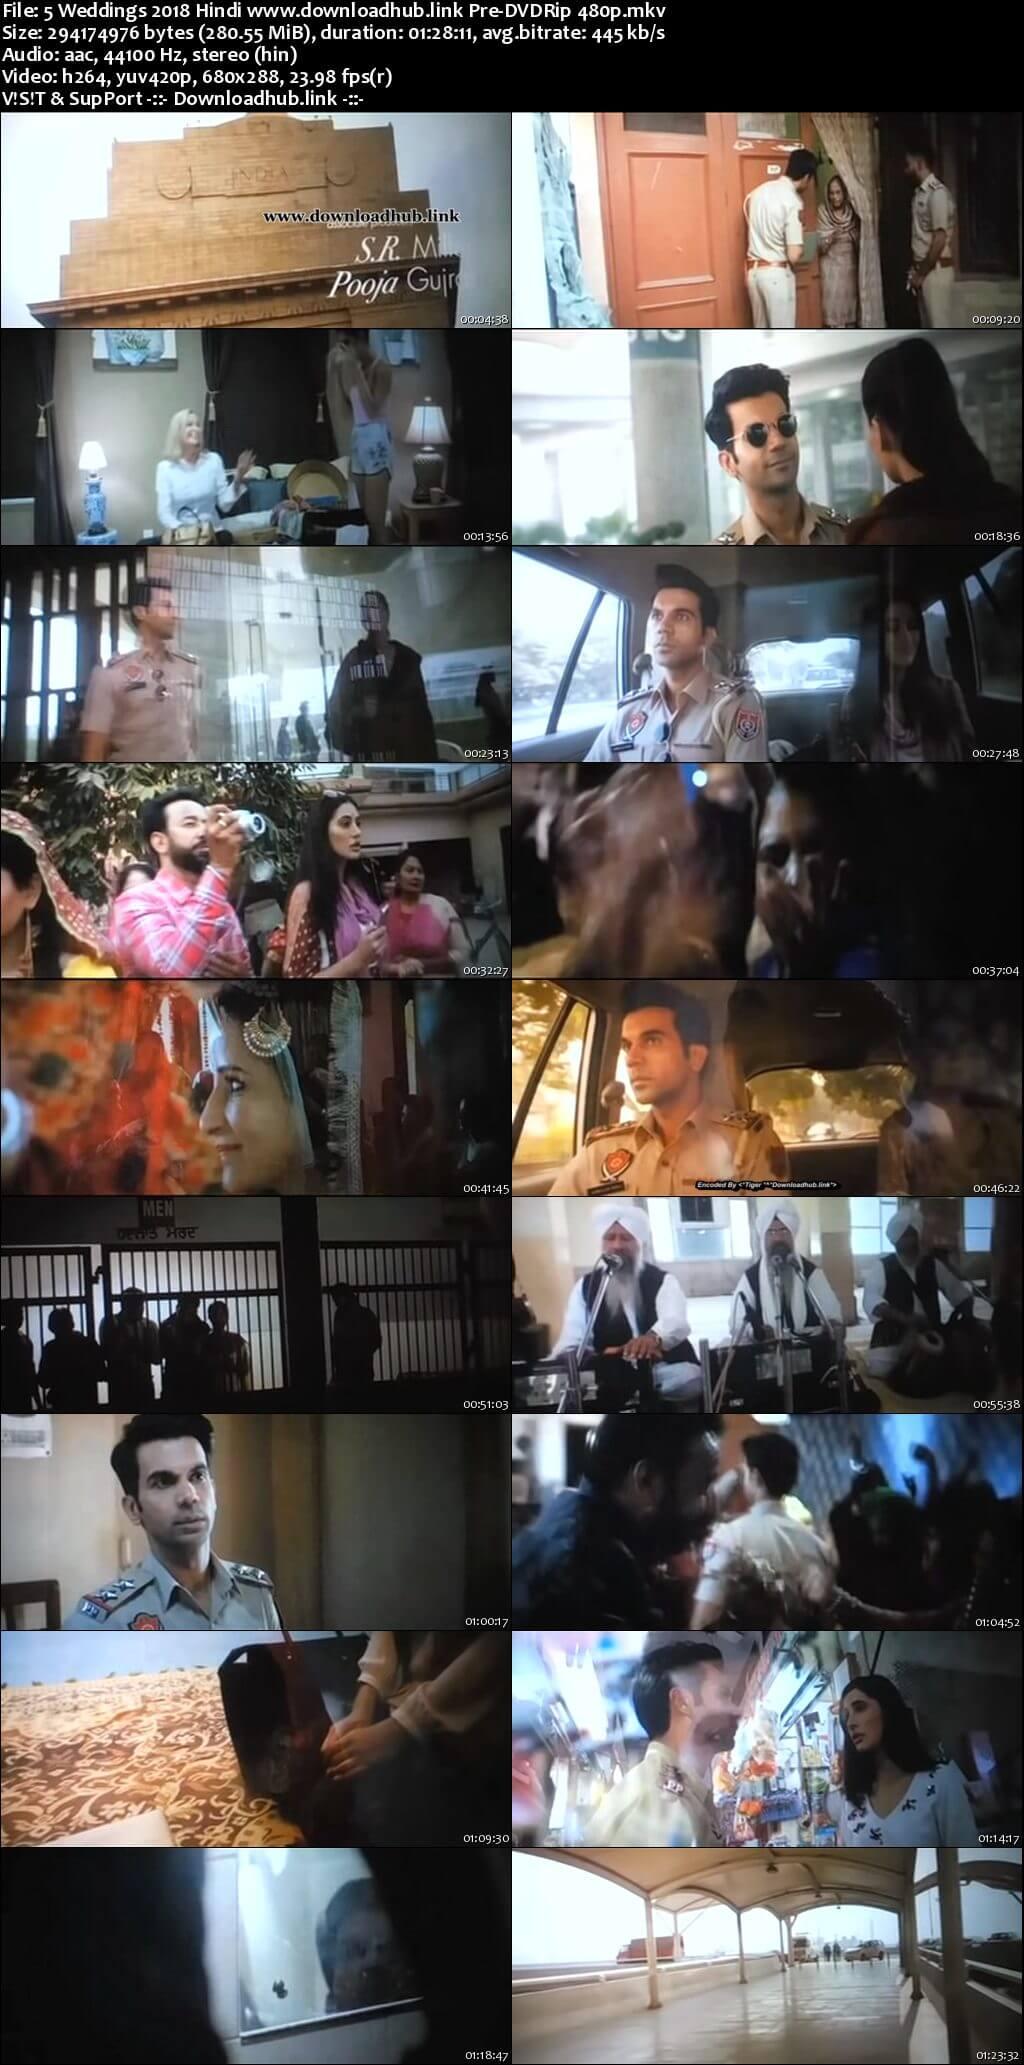 5 Weddings 2018 Hindi 280MB Pre-DVDRip 480p